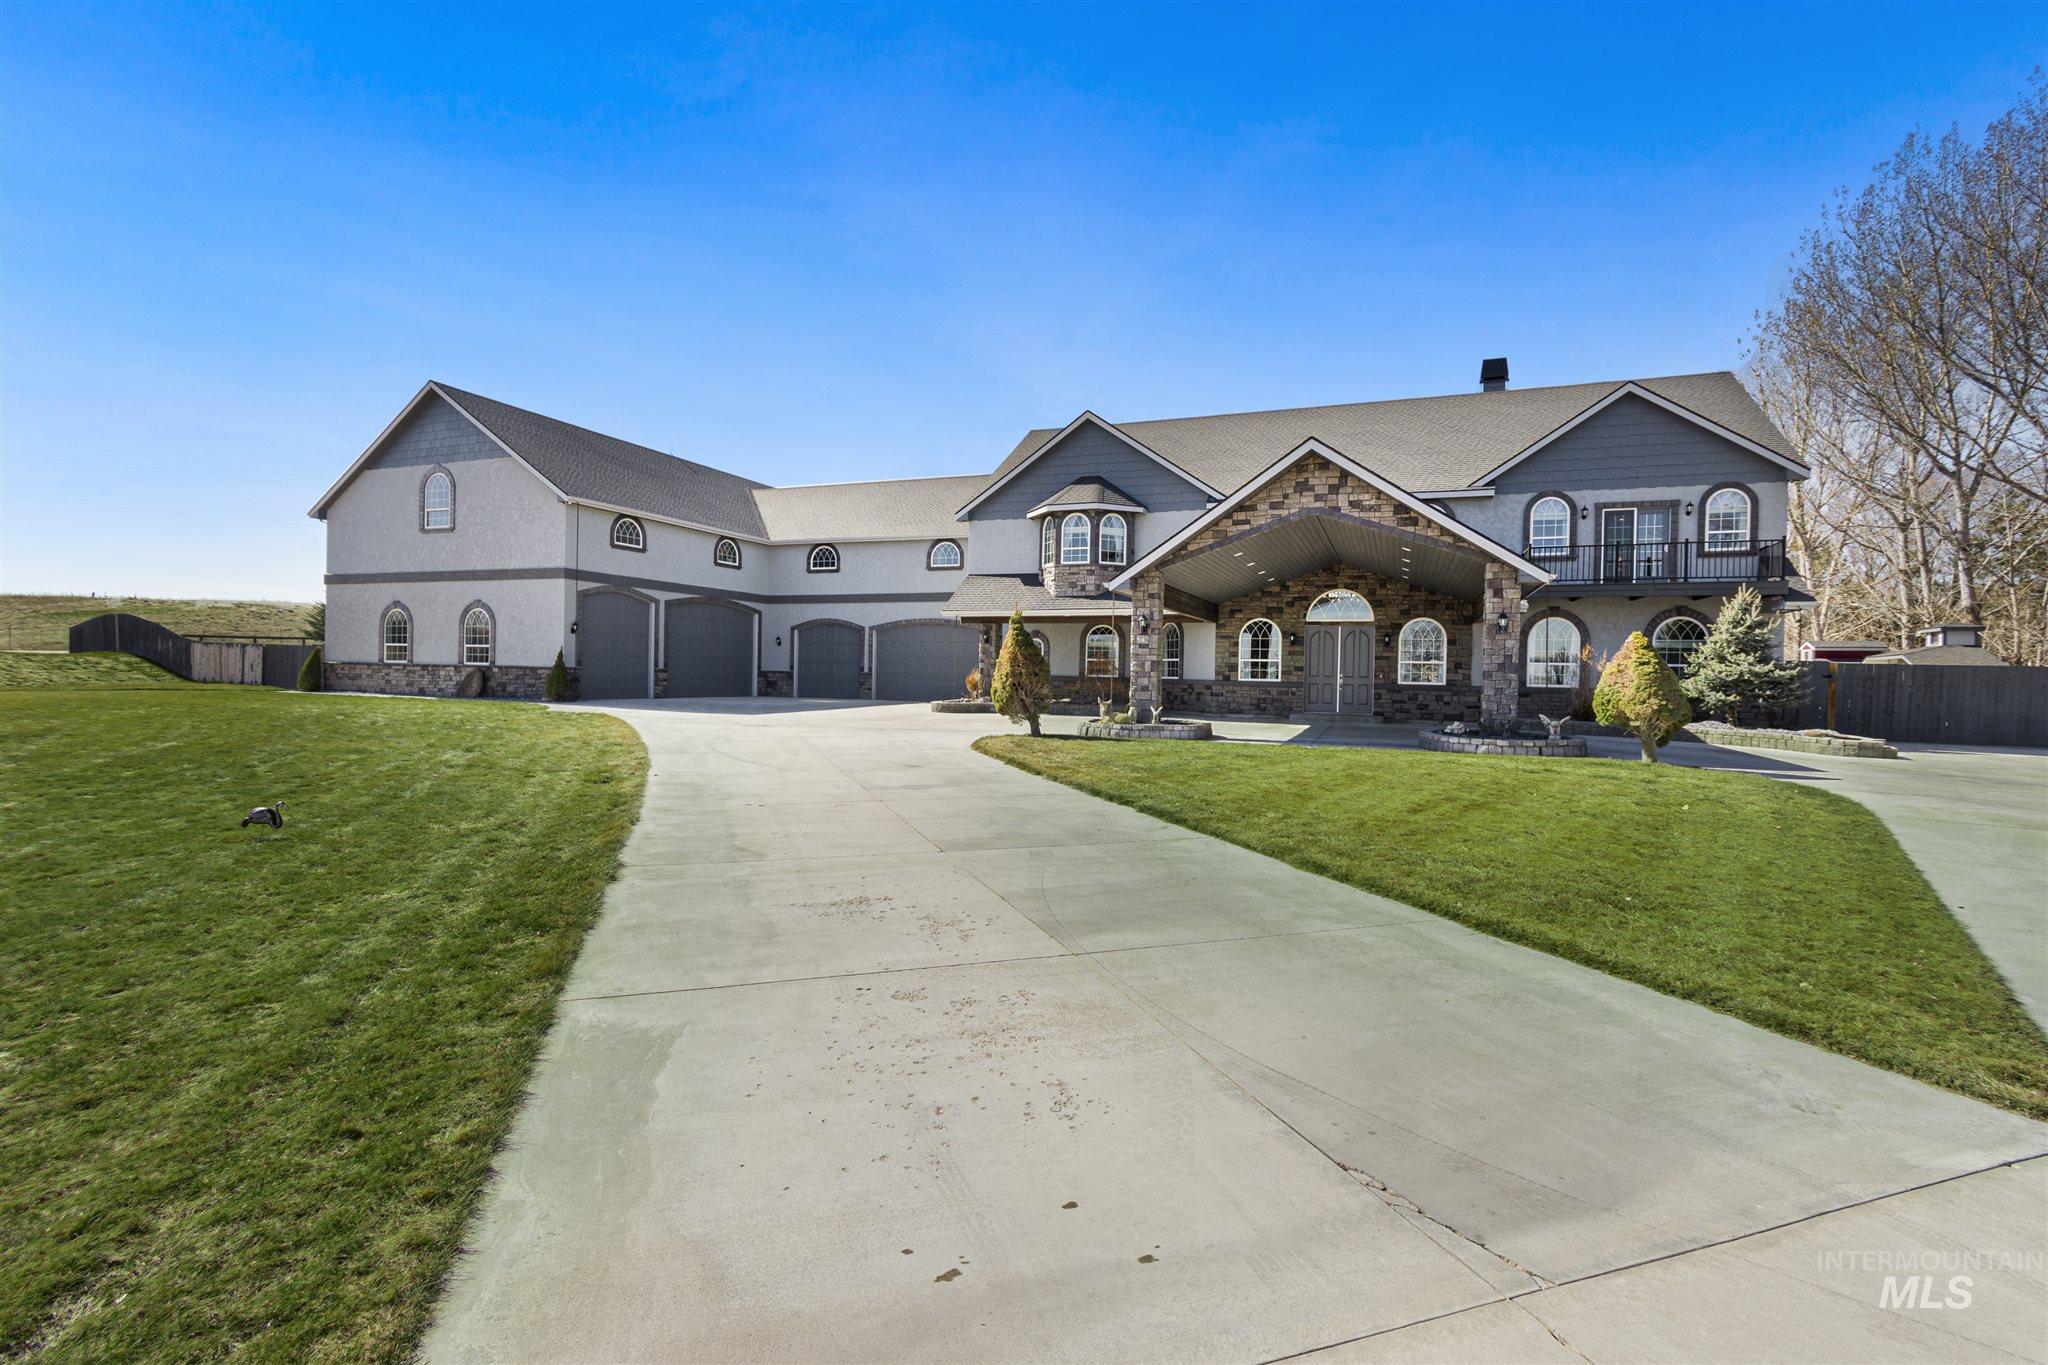 1551 S Luker Rd Property Photo - Kuna, ID real estate listing